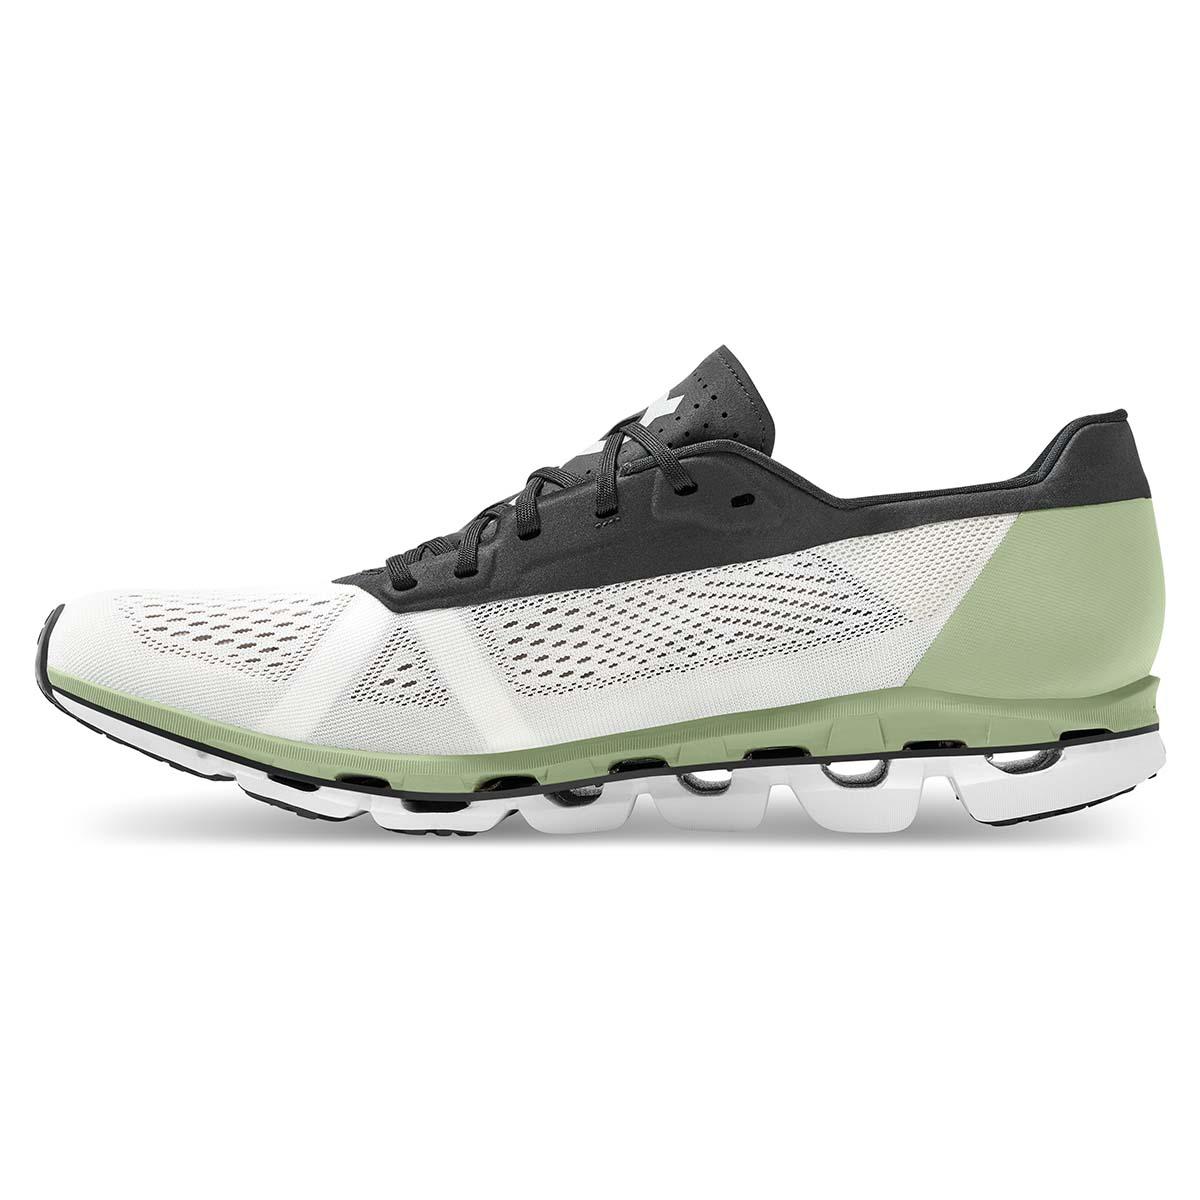 Men's On Cloudboom Running Shoe - Color: White/Black - Size: 7 - Width: Regular, White/Black, large, image 3